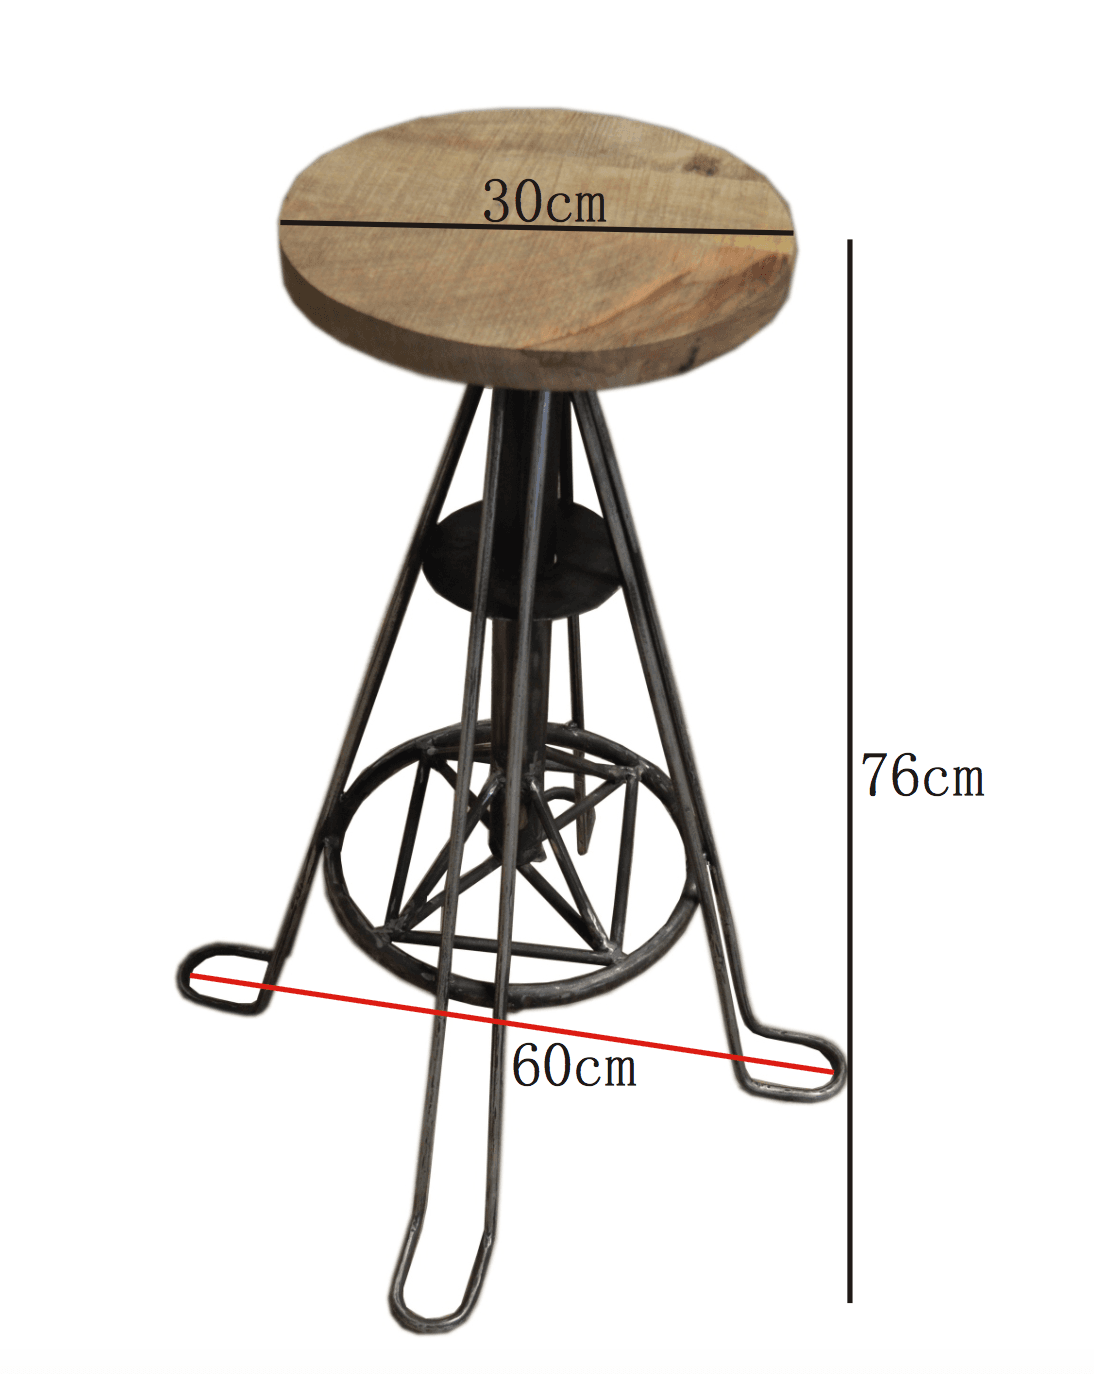 Tabouret industriel bois métal eiffel 1